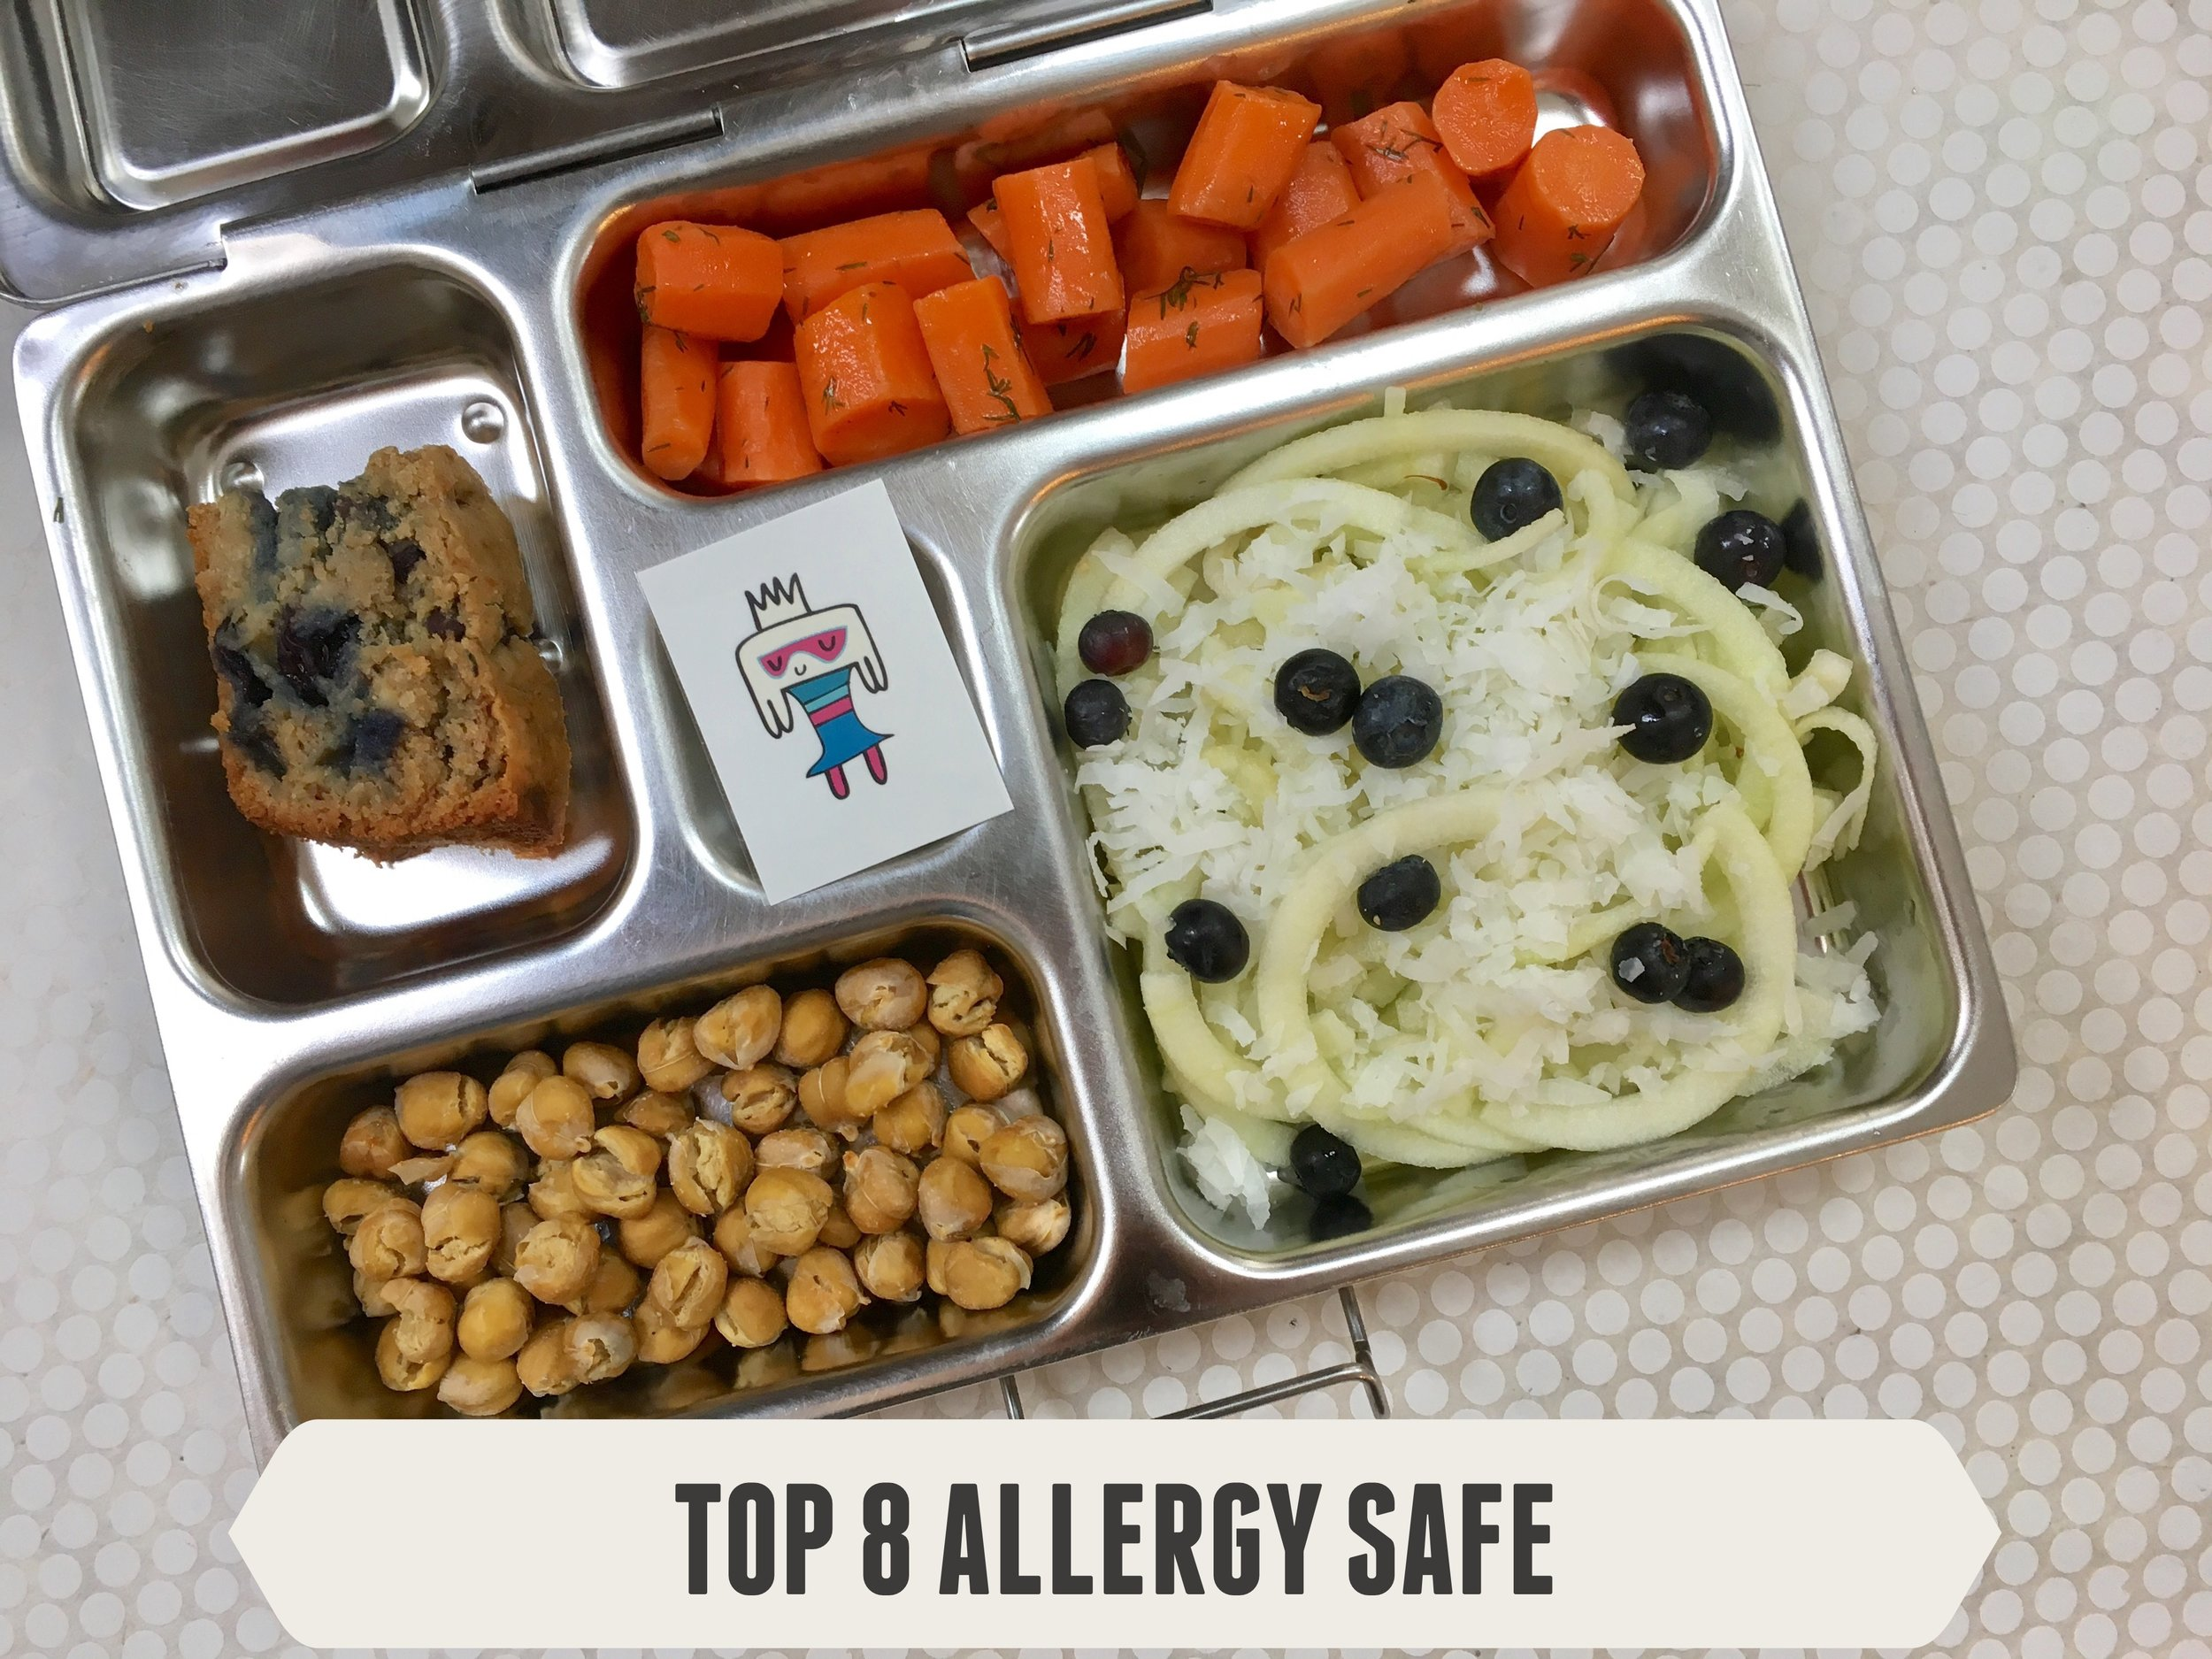 top 8 allergy safe #6